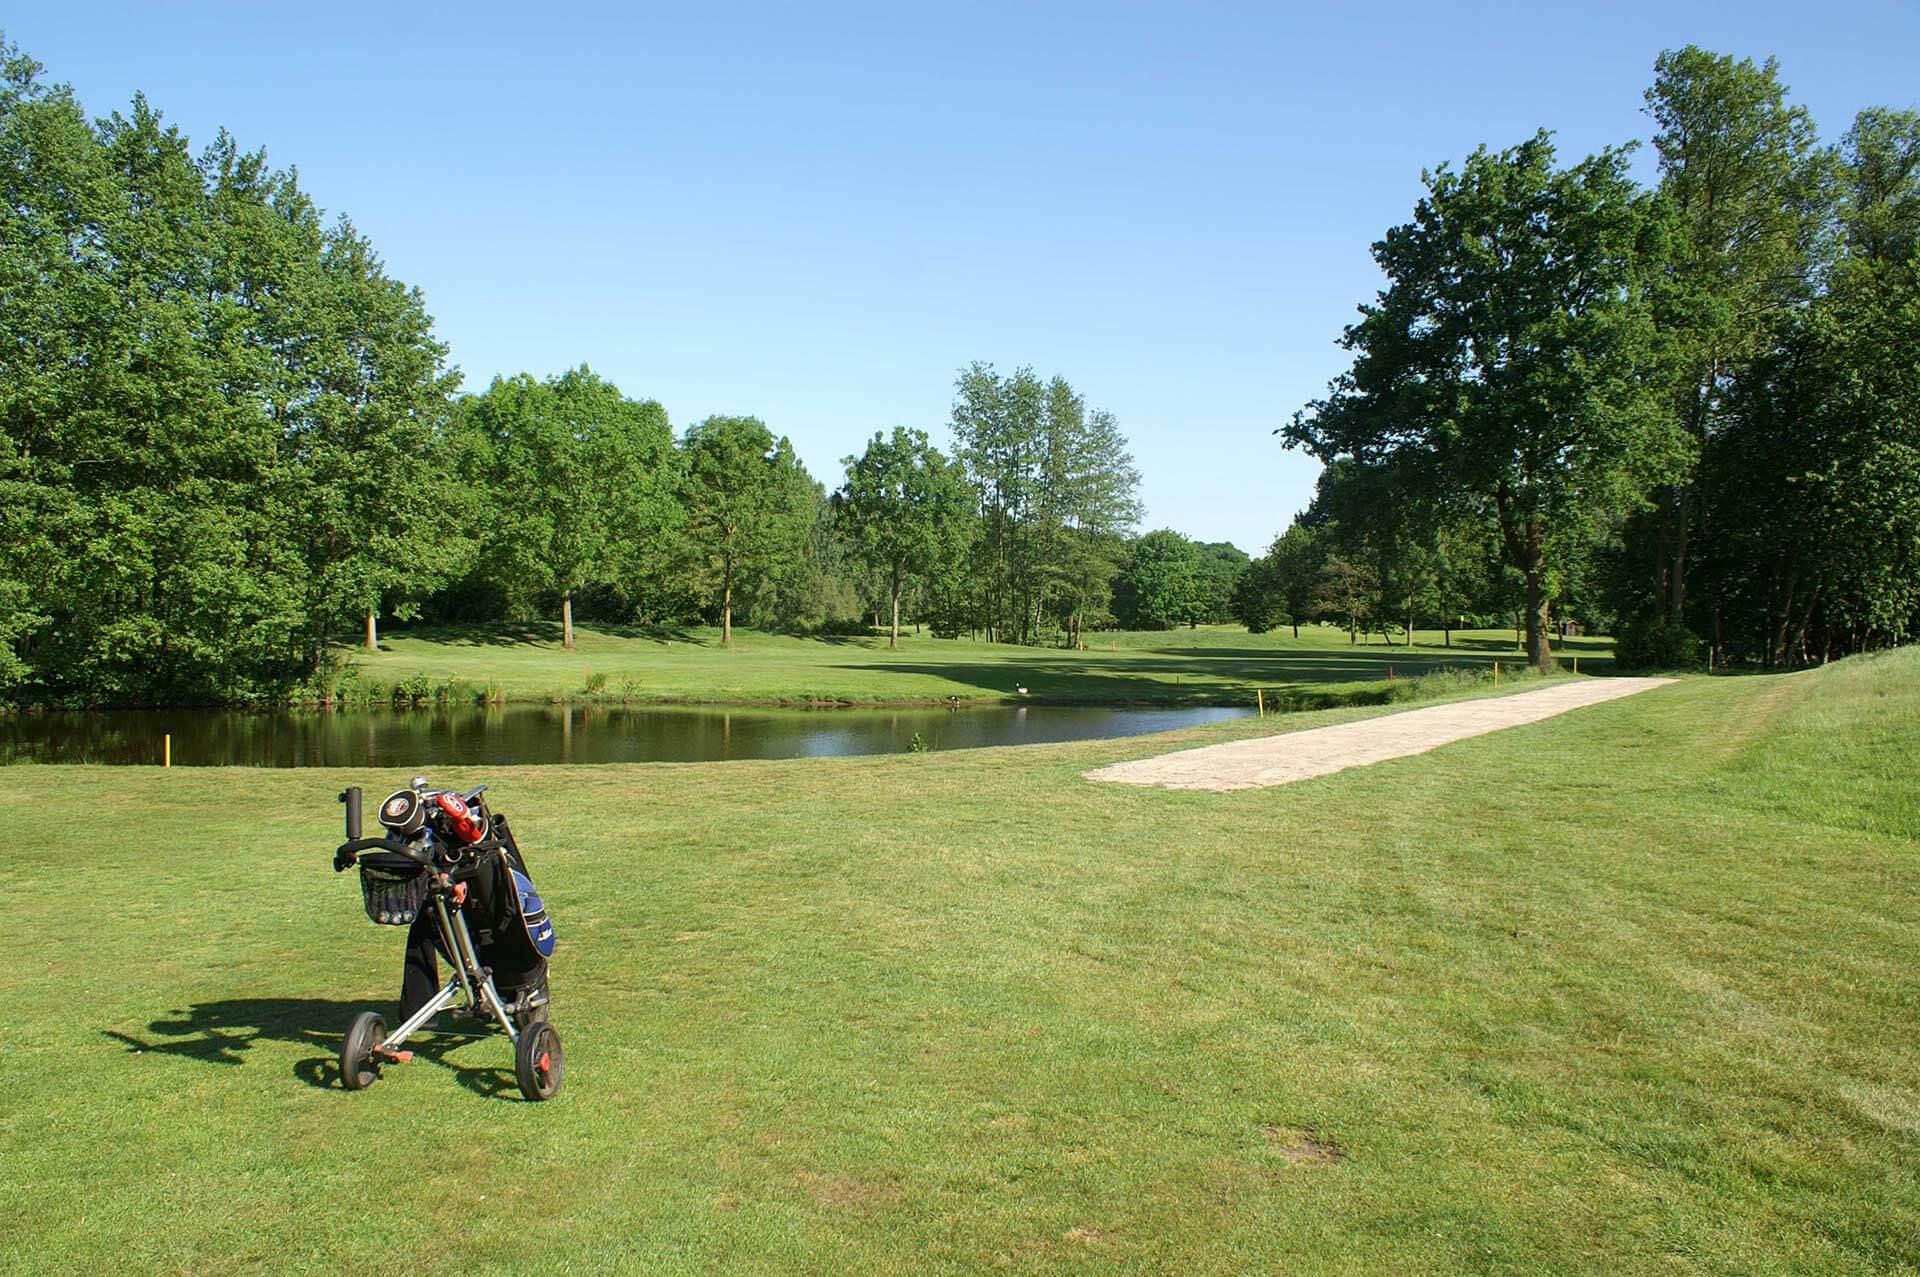 https://golfclub-peckeloh.de/wp-content/uploads/2018/02/PICT0439-4.jpg